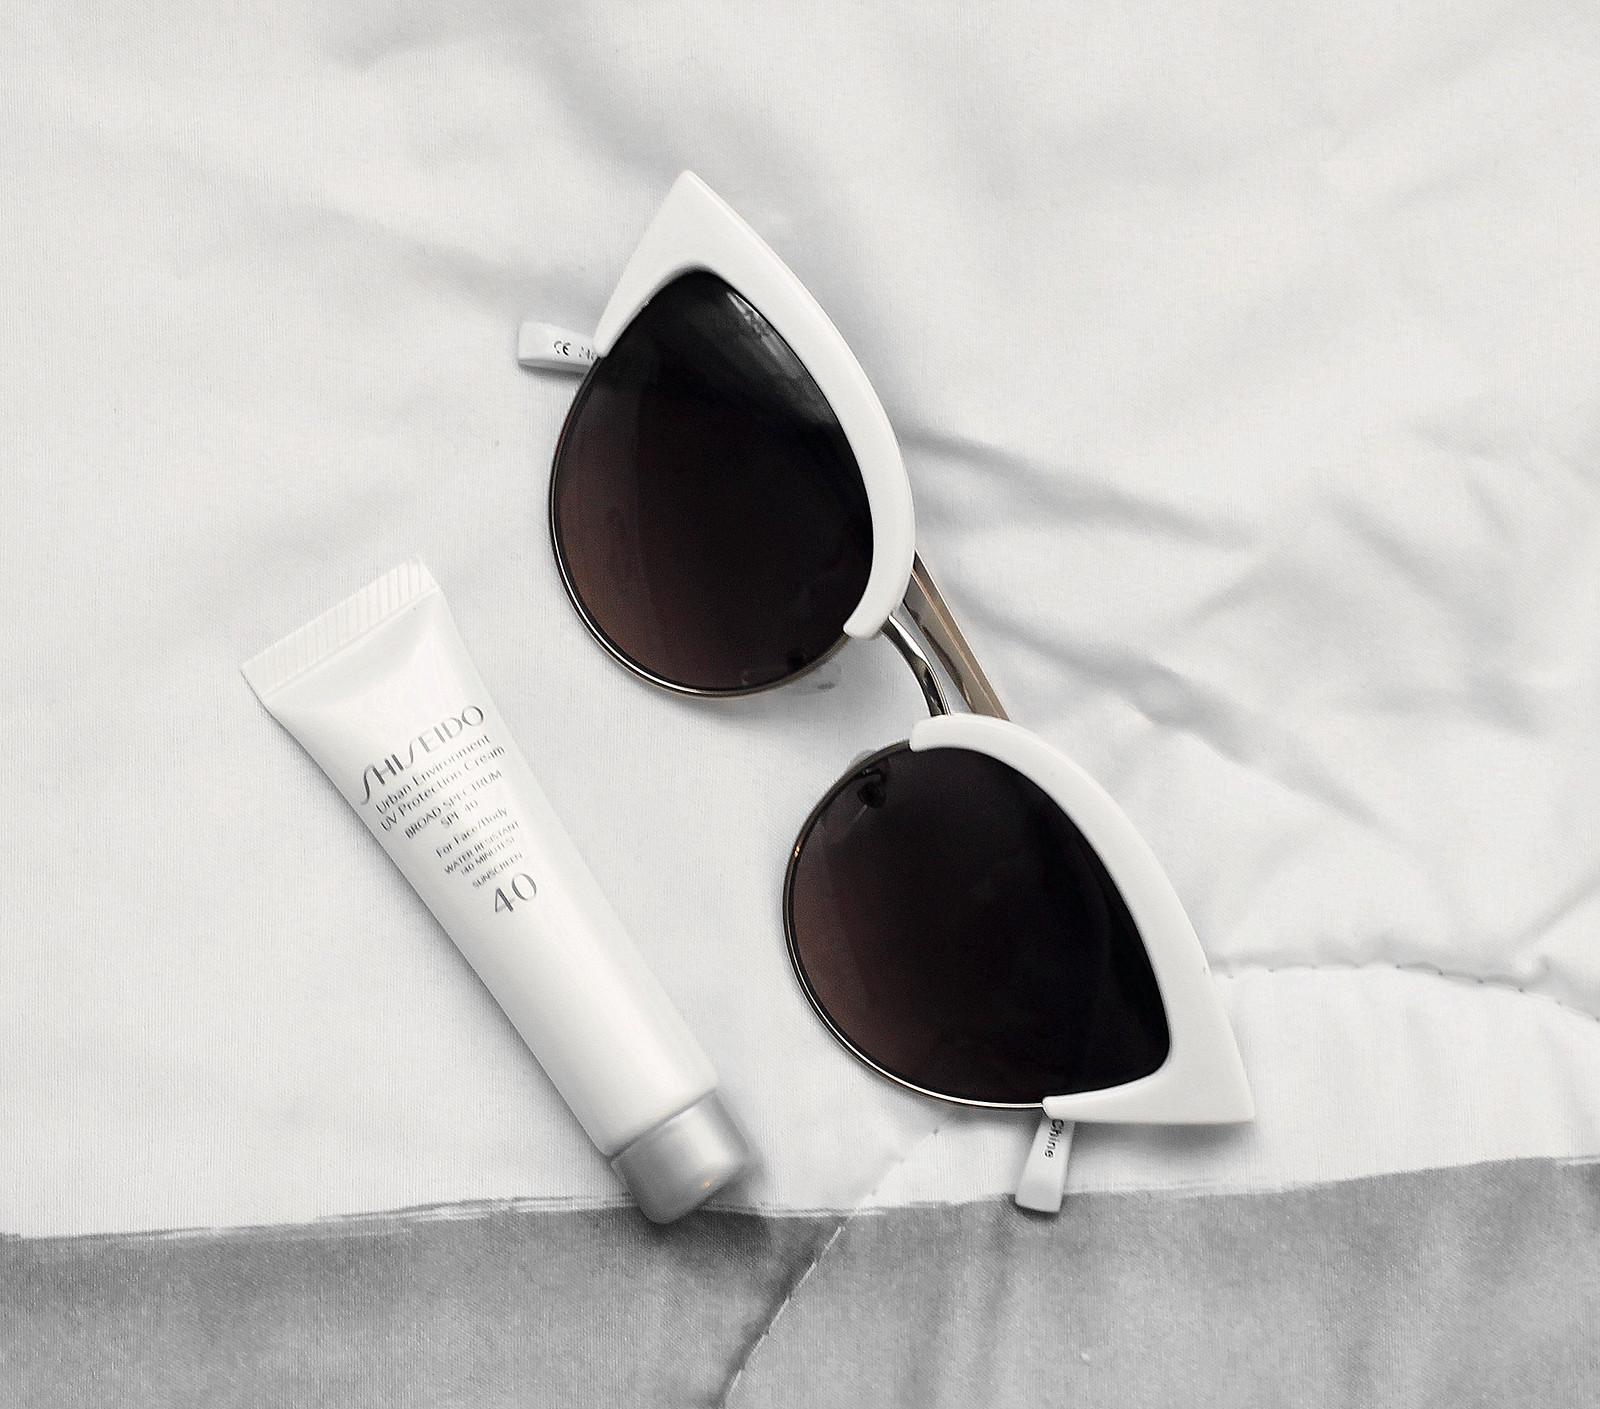 3274-shiseido-sunscreen-sunblock-spf40-urban-environment-elizabeeetht-clothestoyouuu